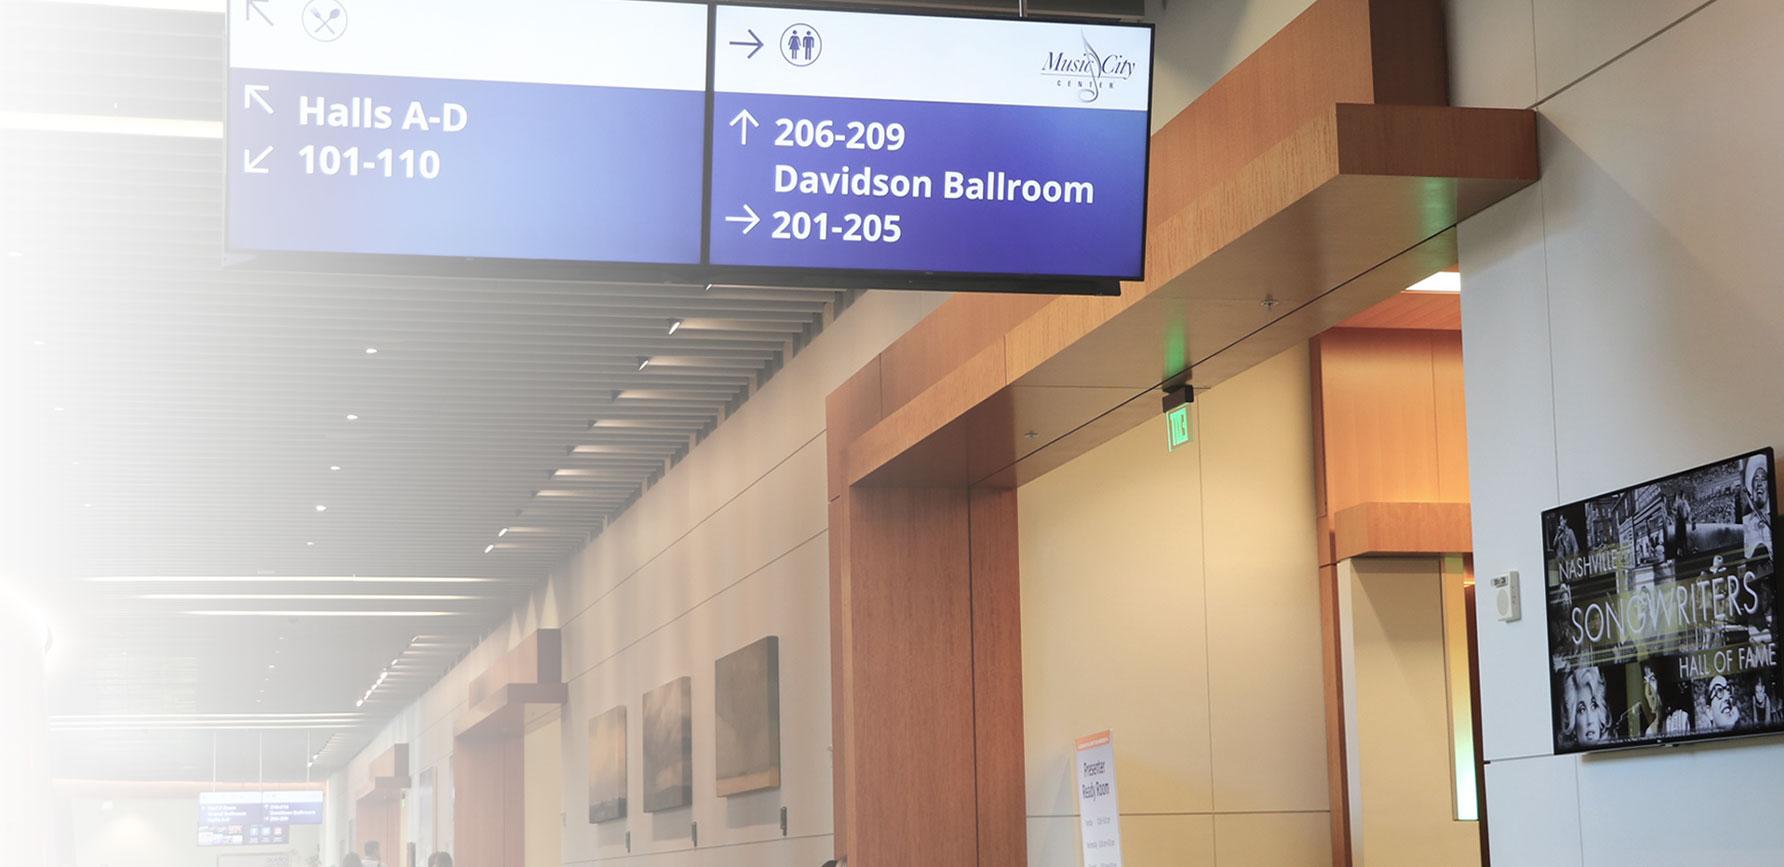 Venues & Convention Centers